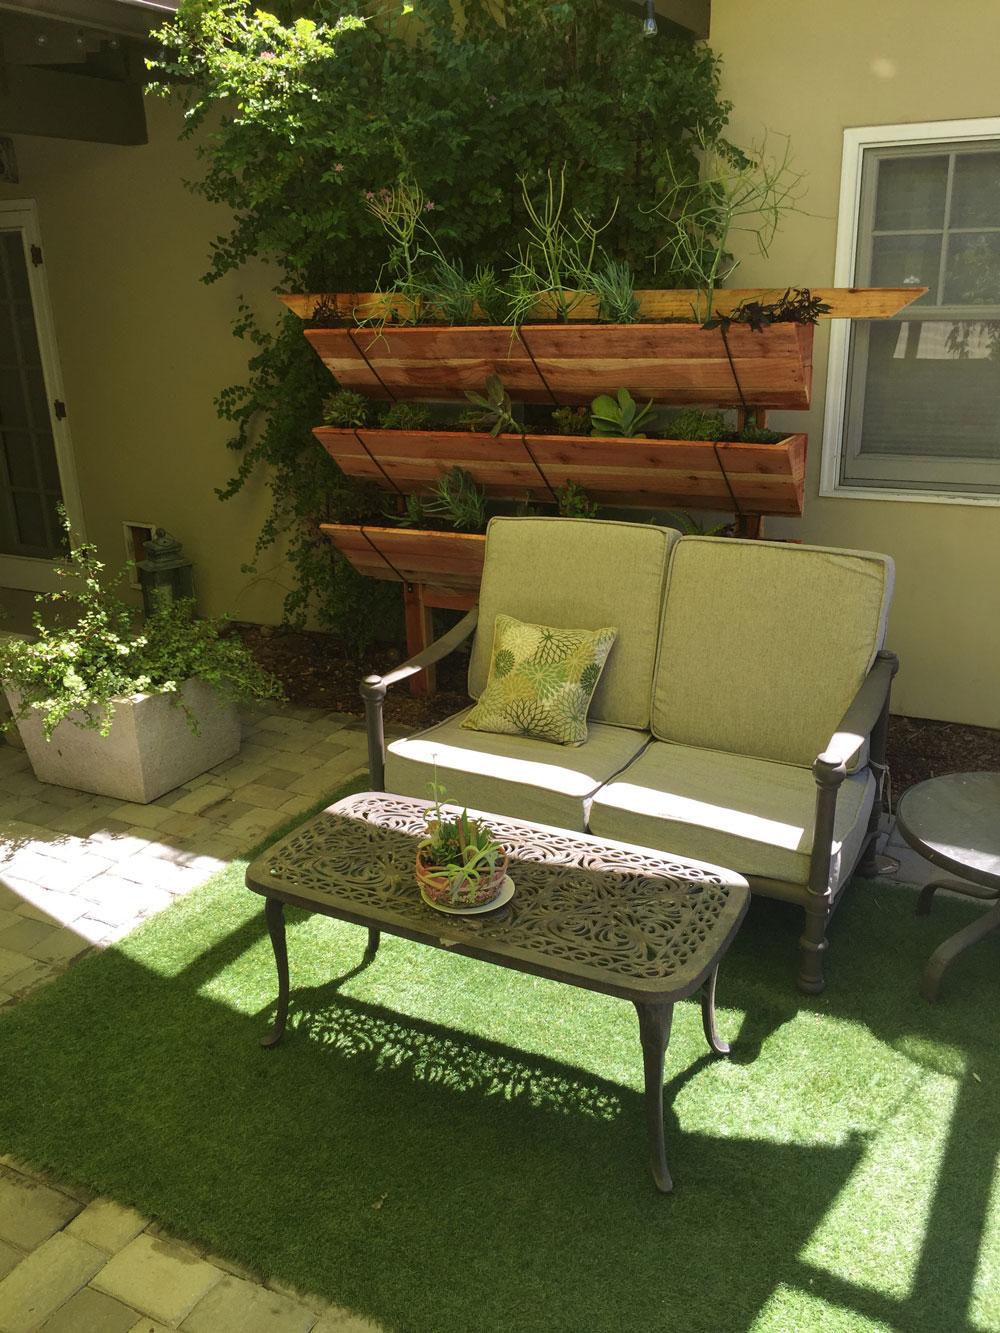 urban sofa gallery blue sofas for sale addition 5 flower street gardens